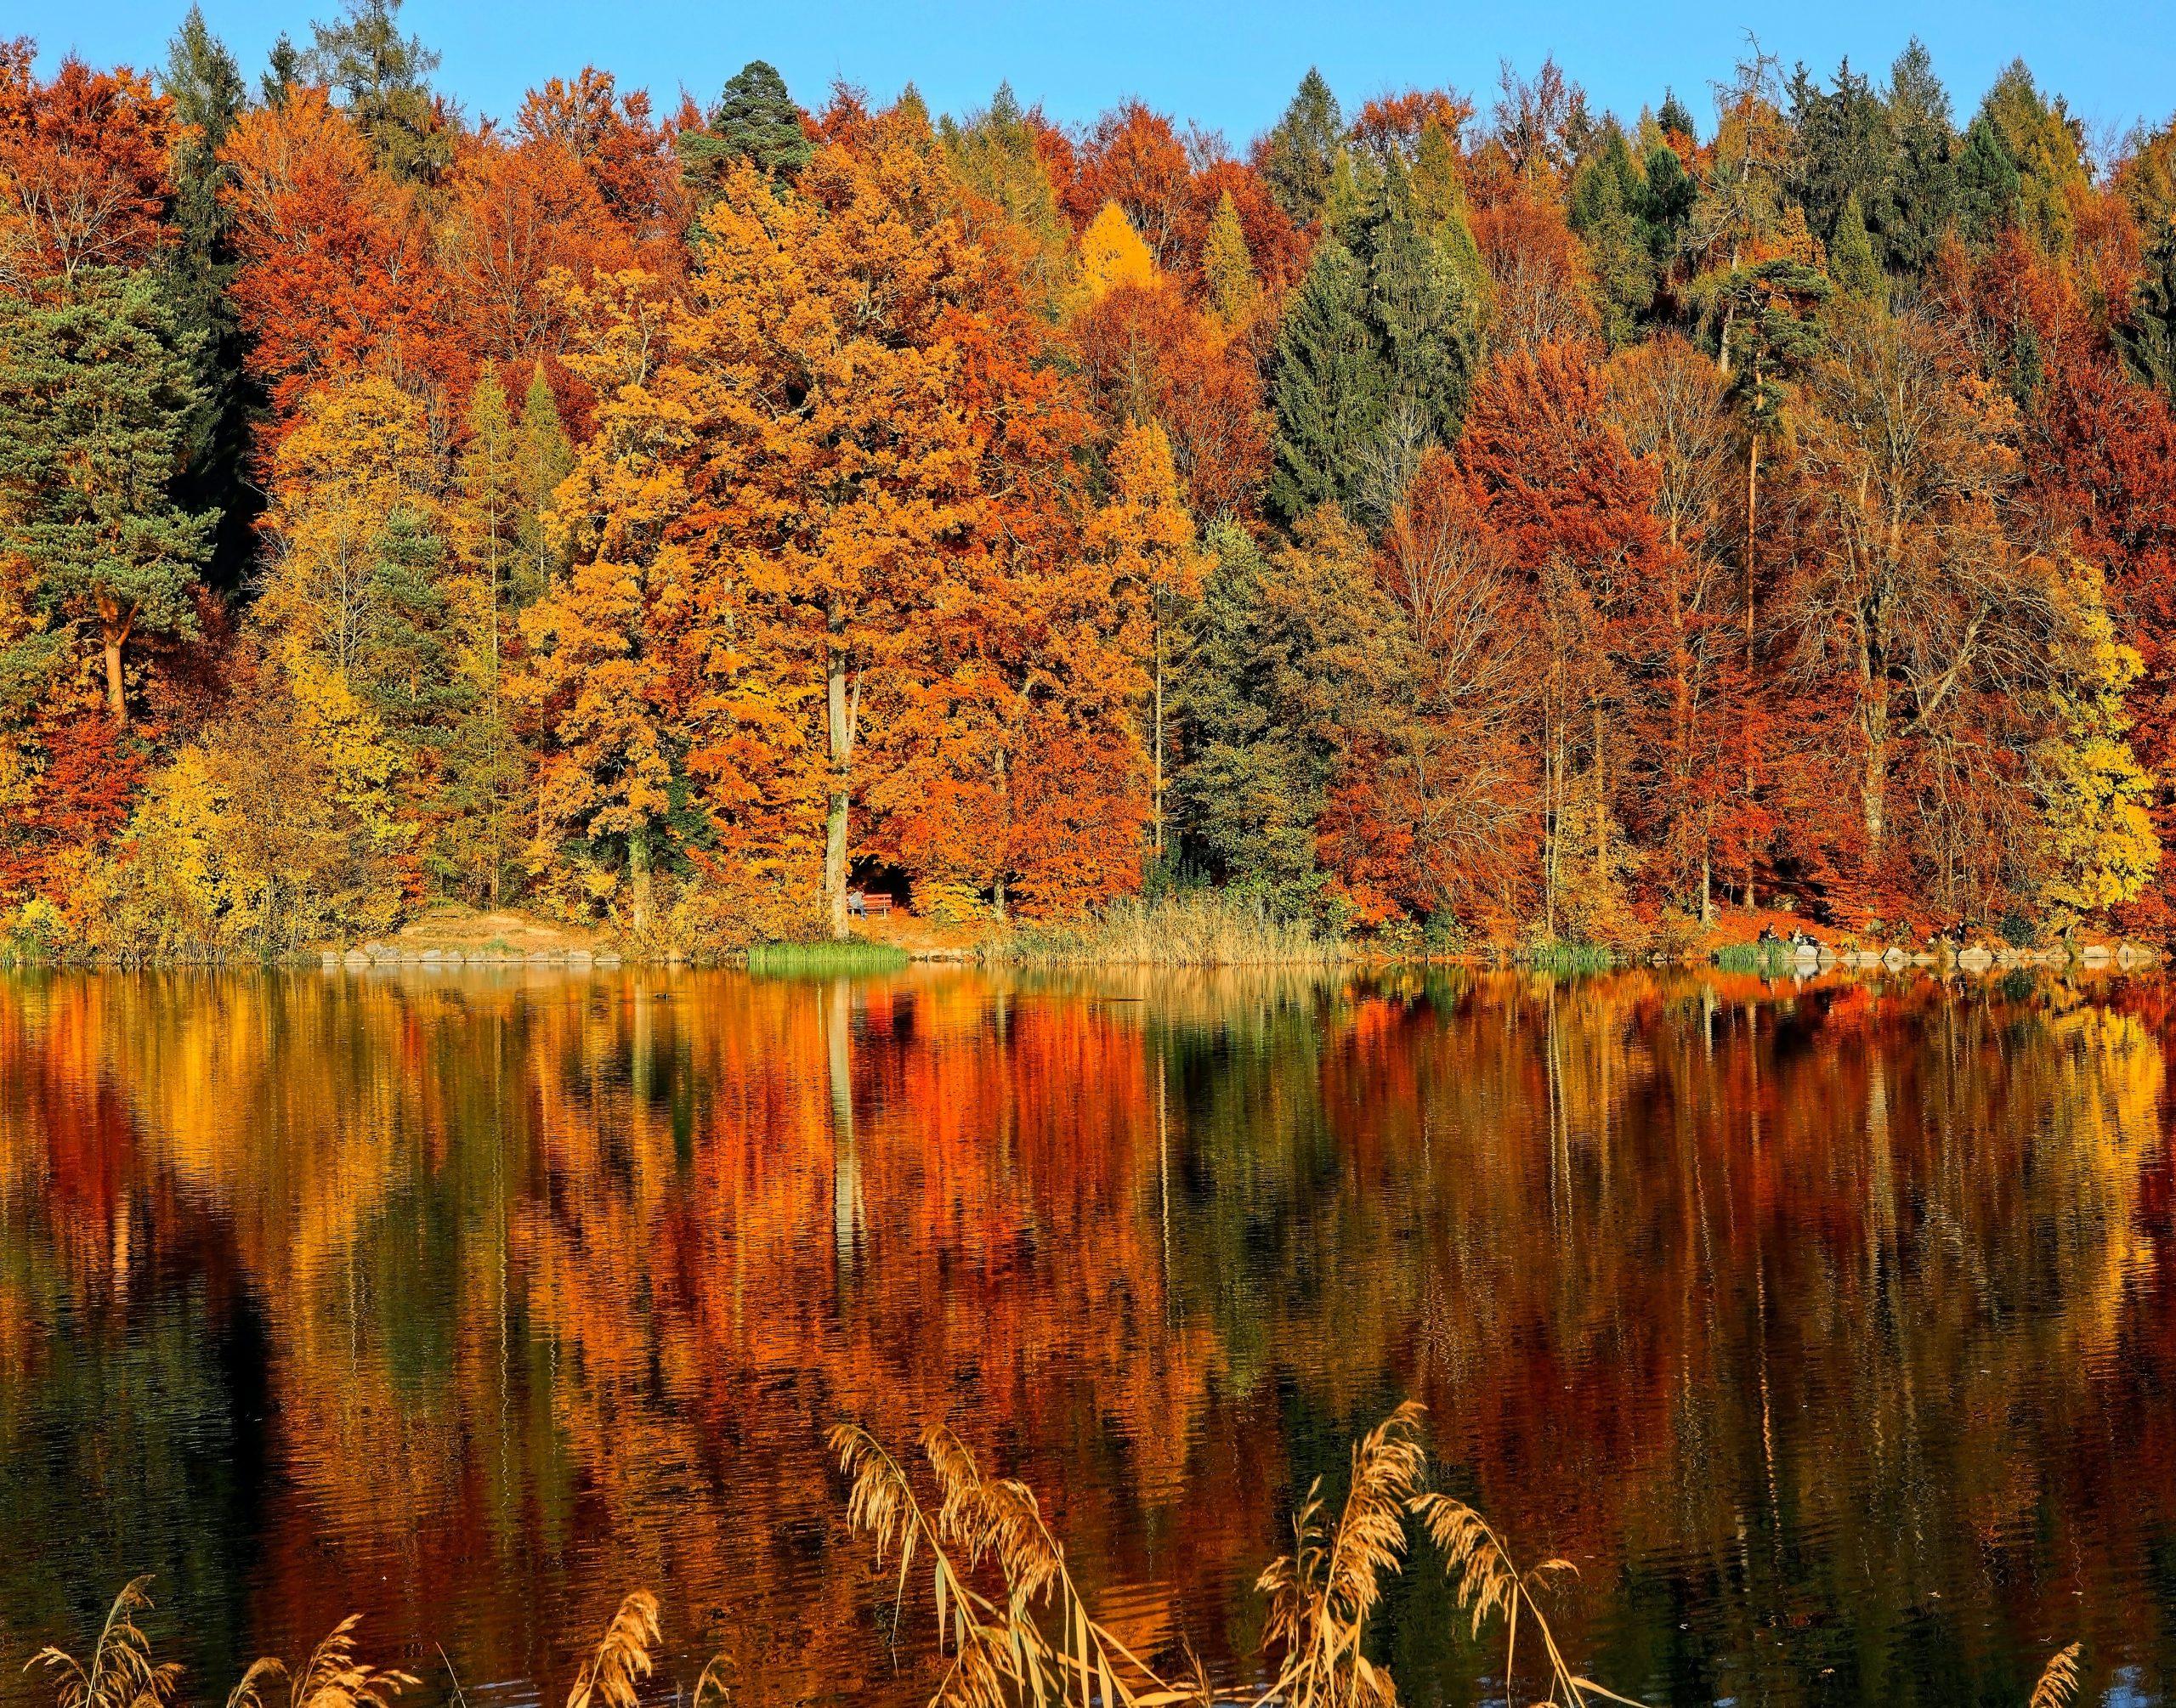 Autumn Scene Across a Lake